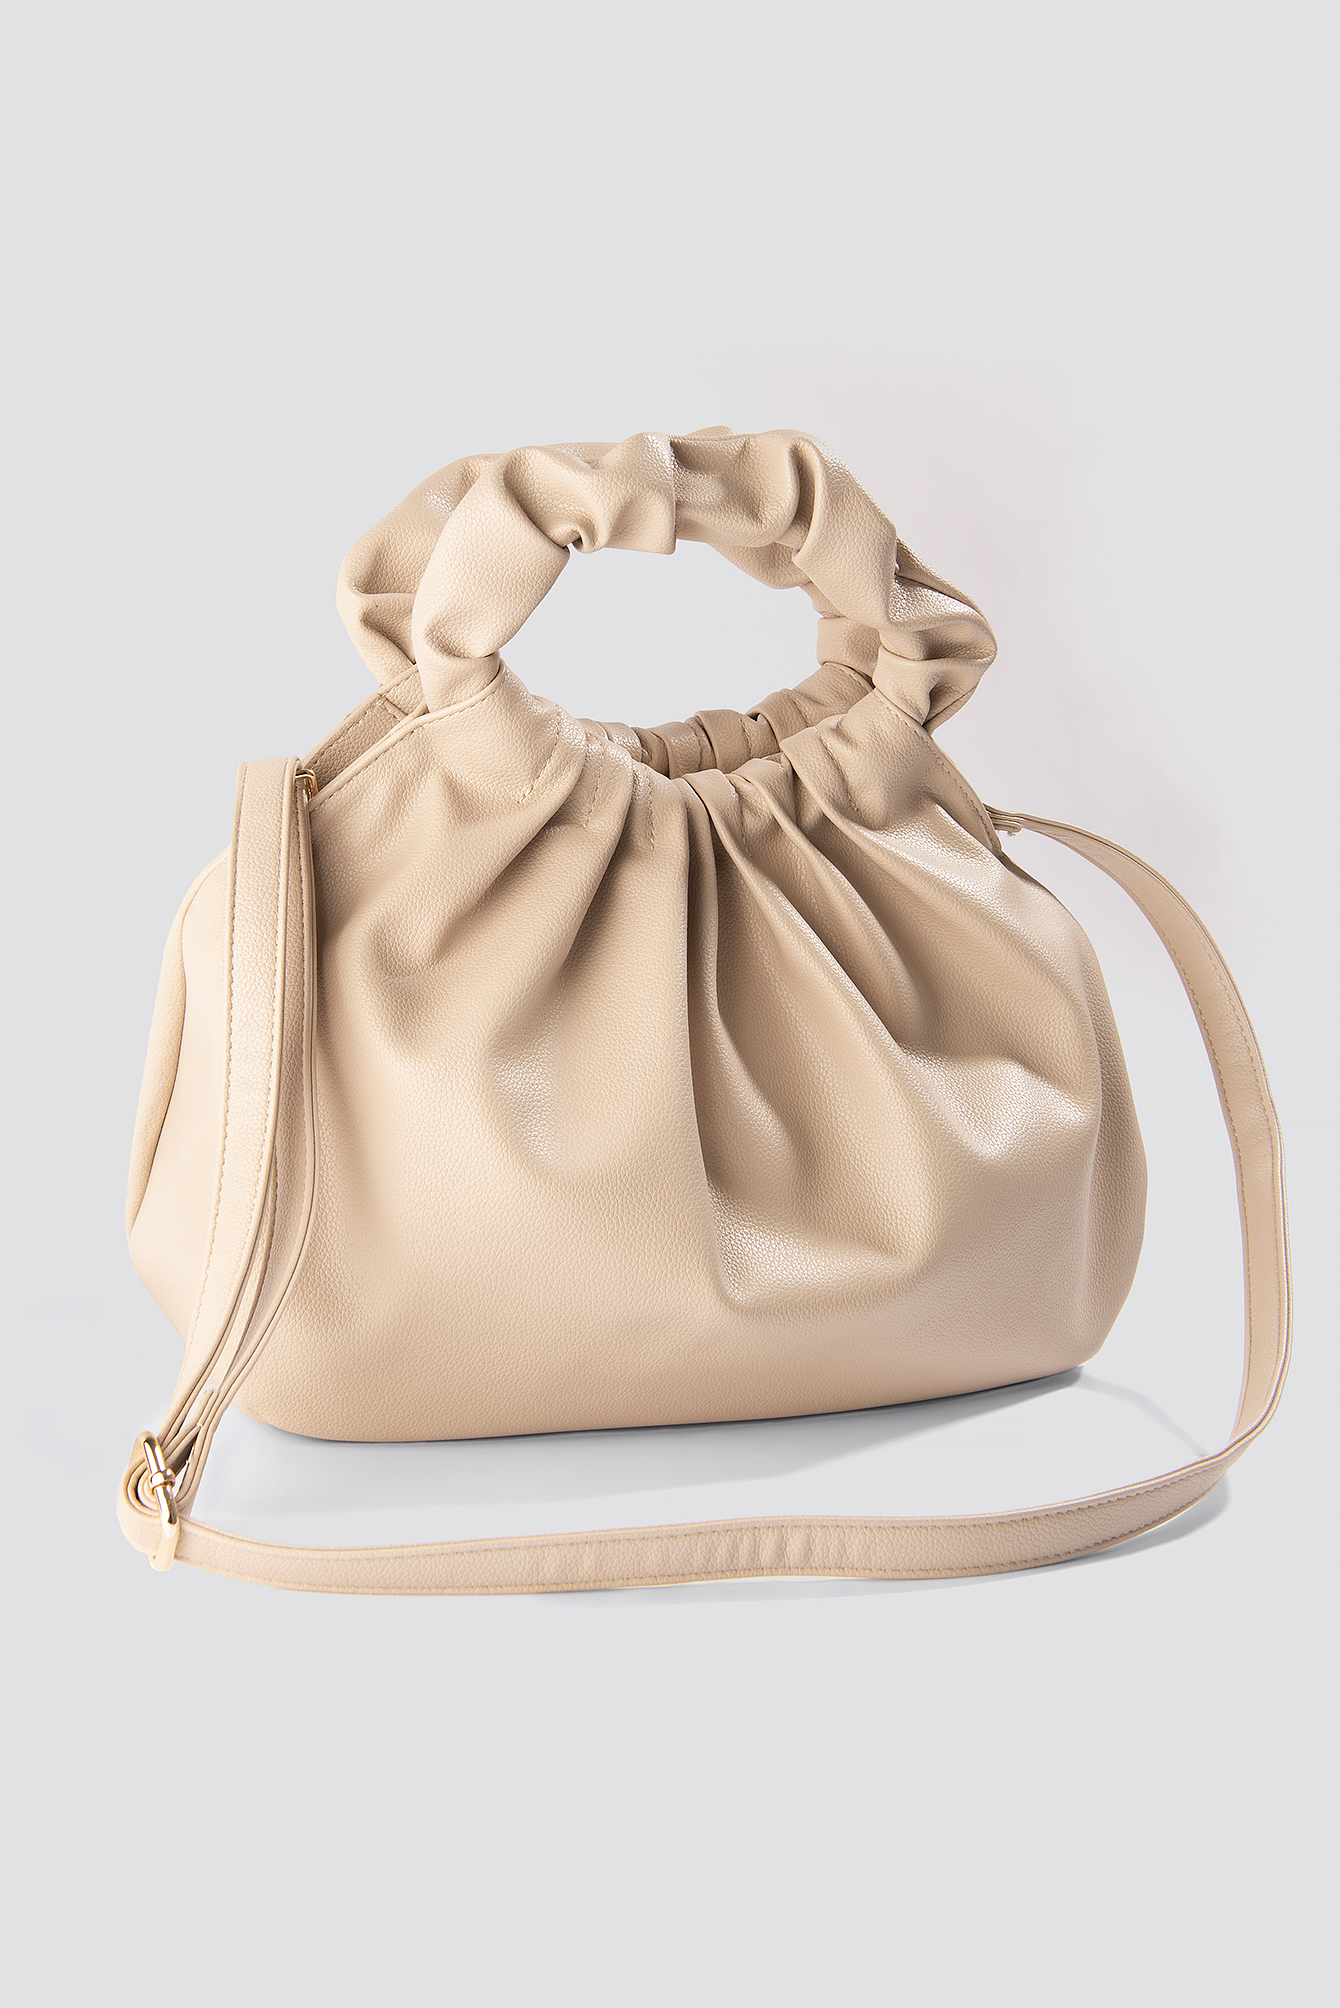 Ruffled Handle Handbag NA-KD.COM